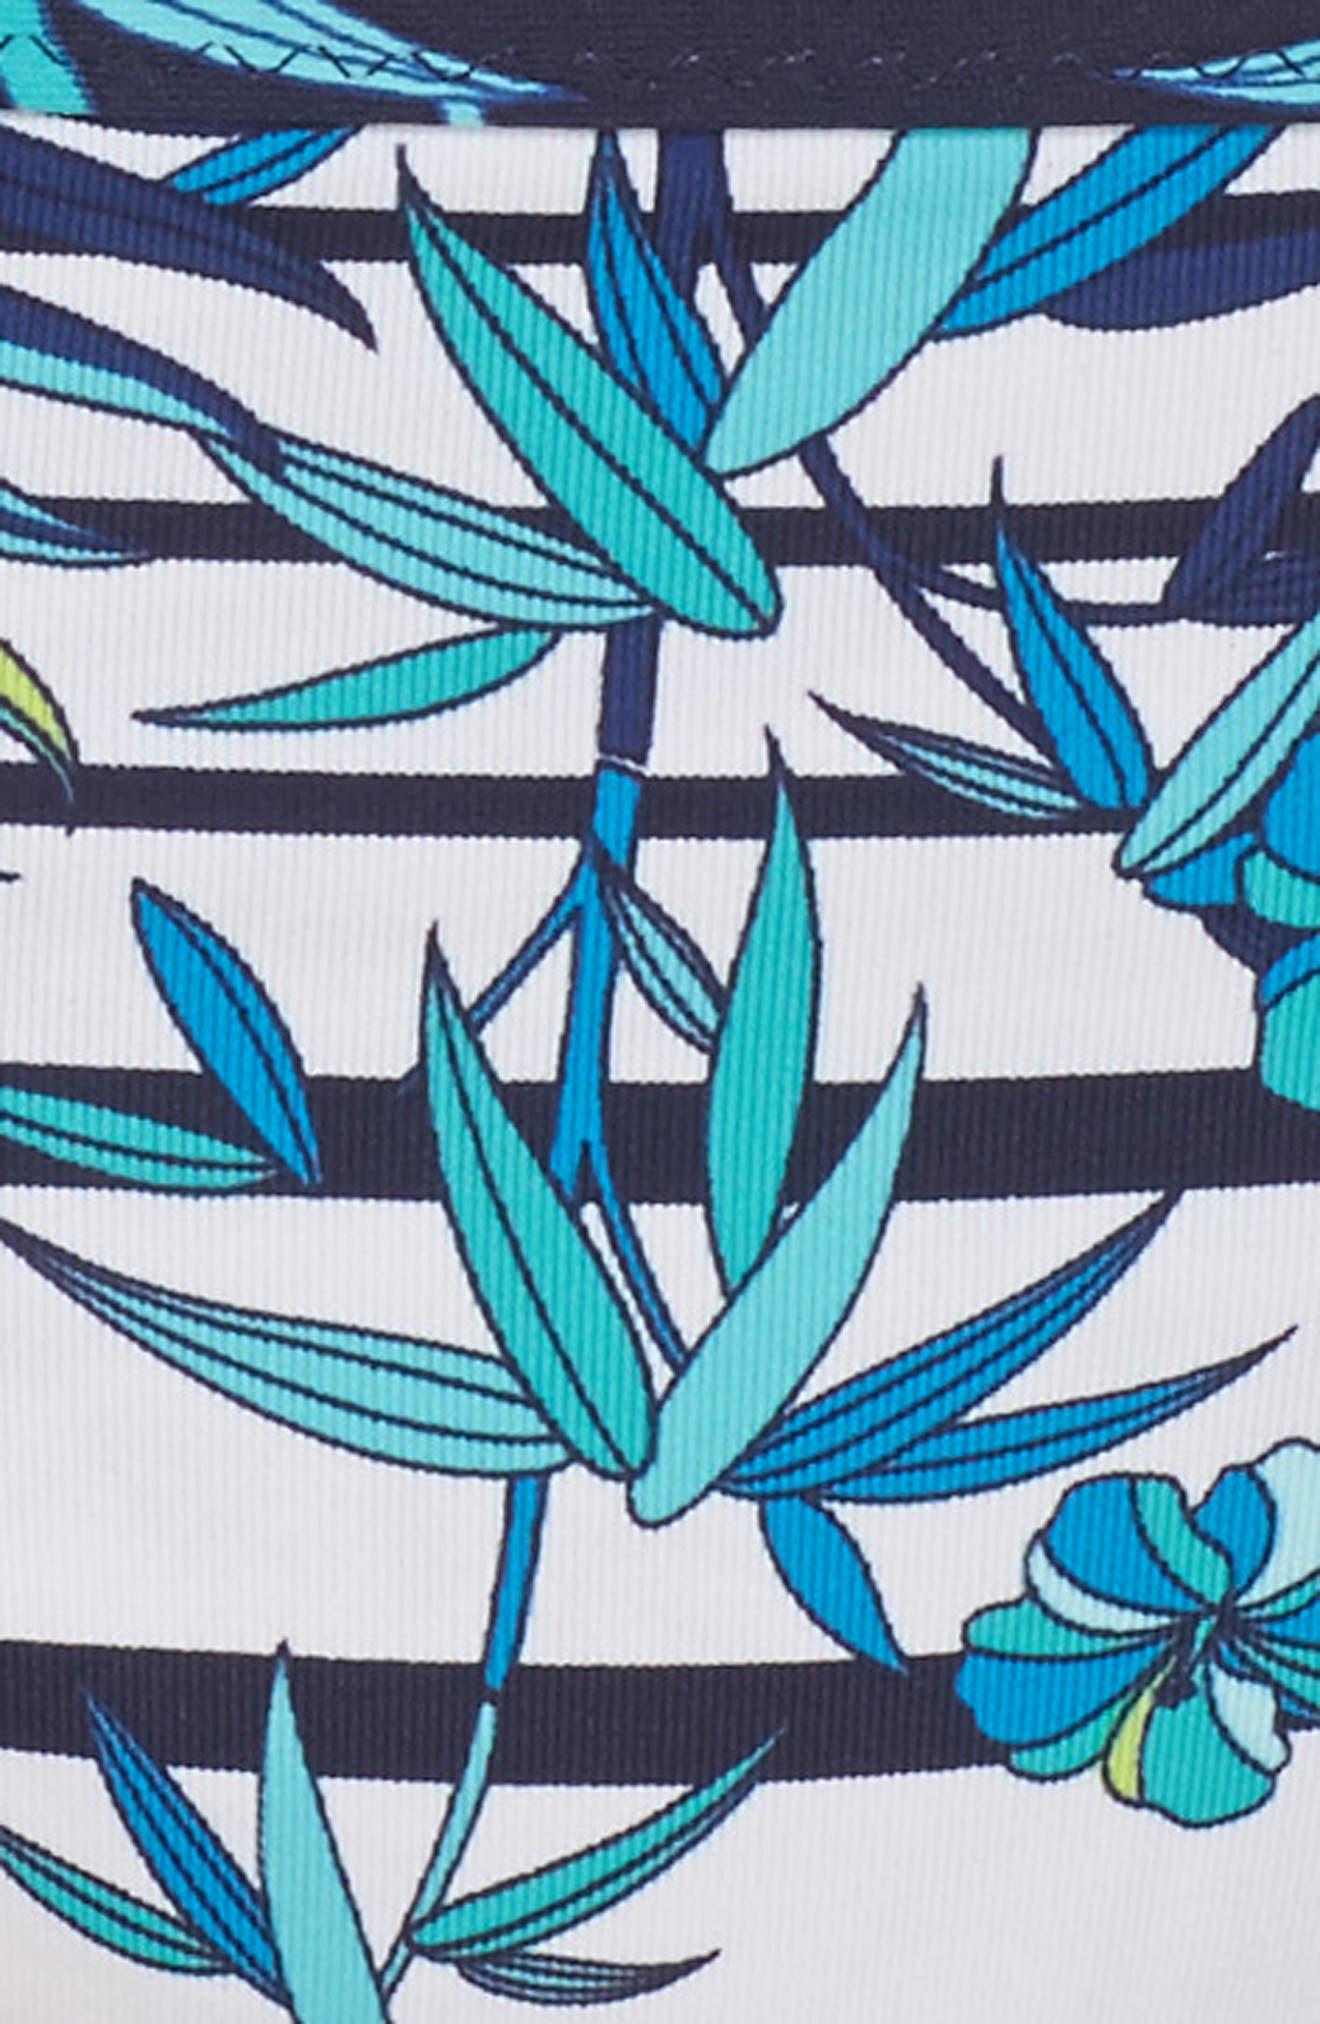 Tropical Swirl Reversible Bikini Bottoms,                             Alternate thumbnail 8, color,                             Blue/ White